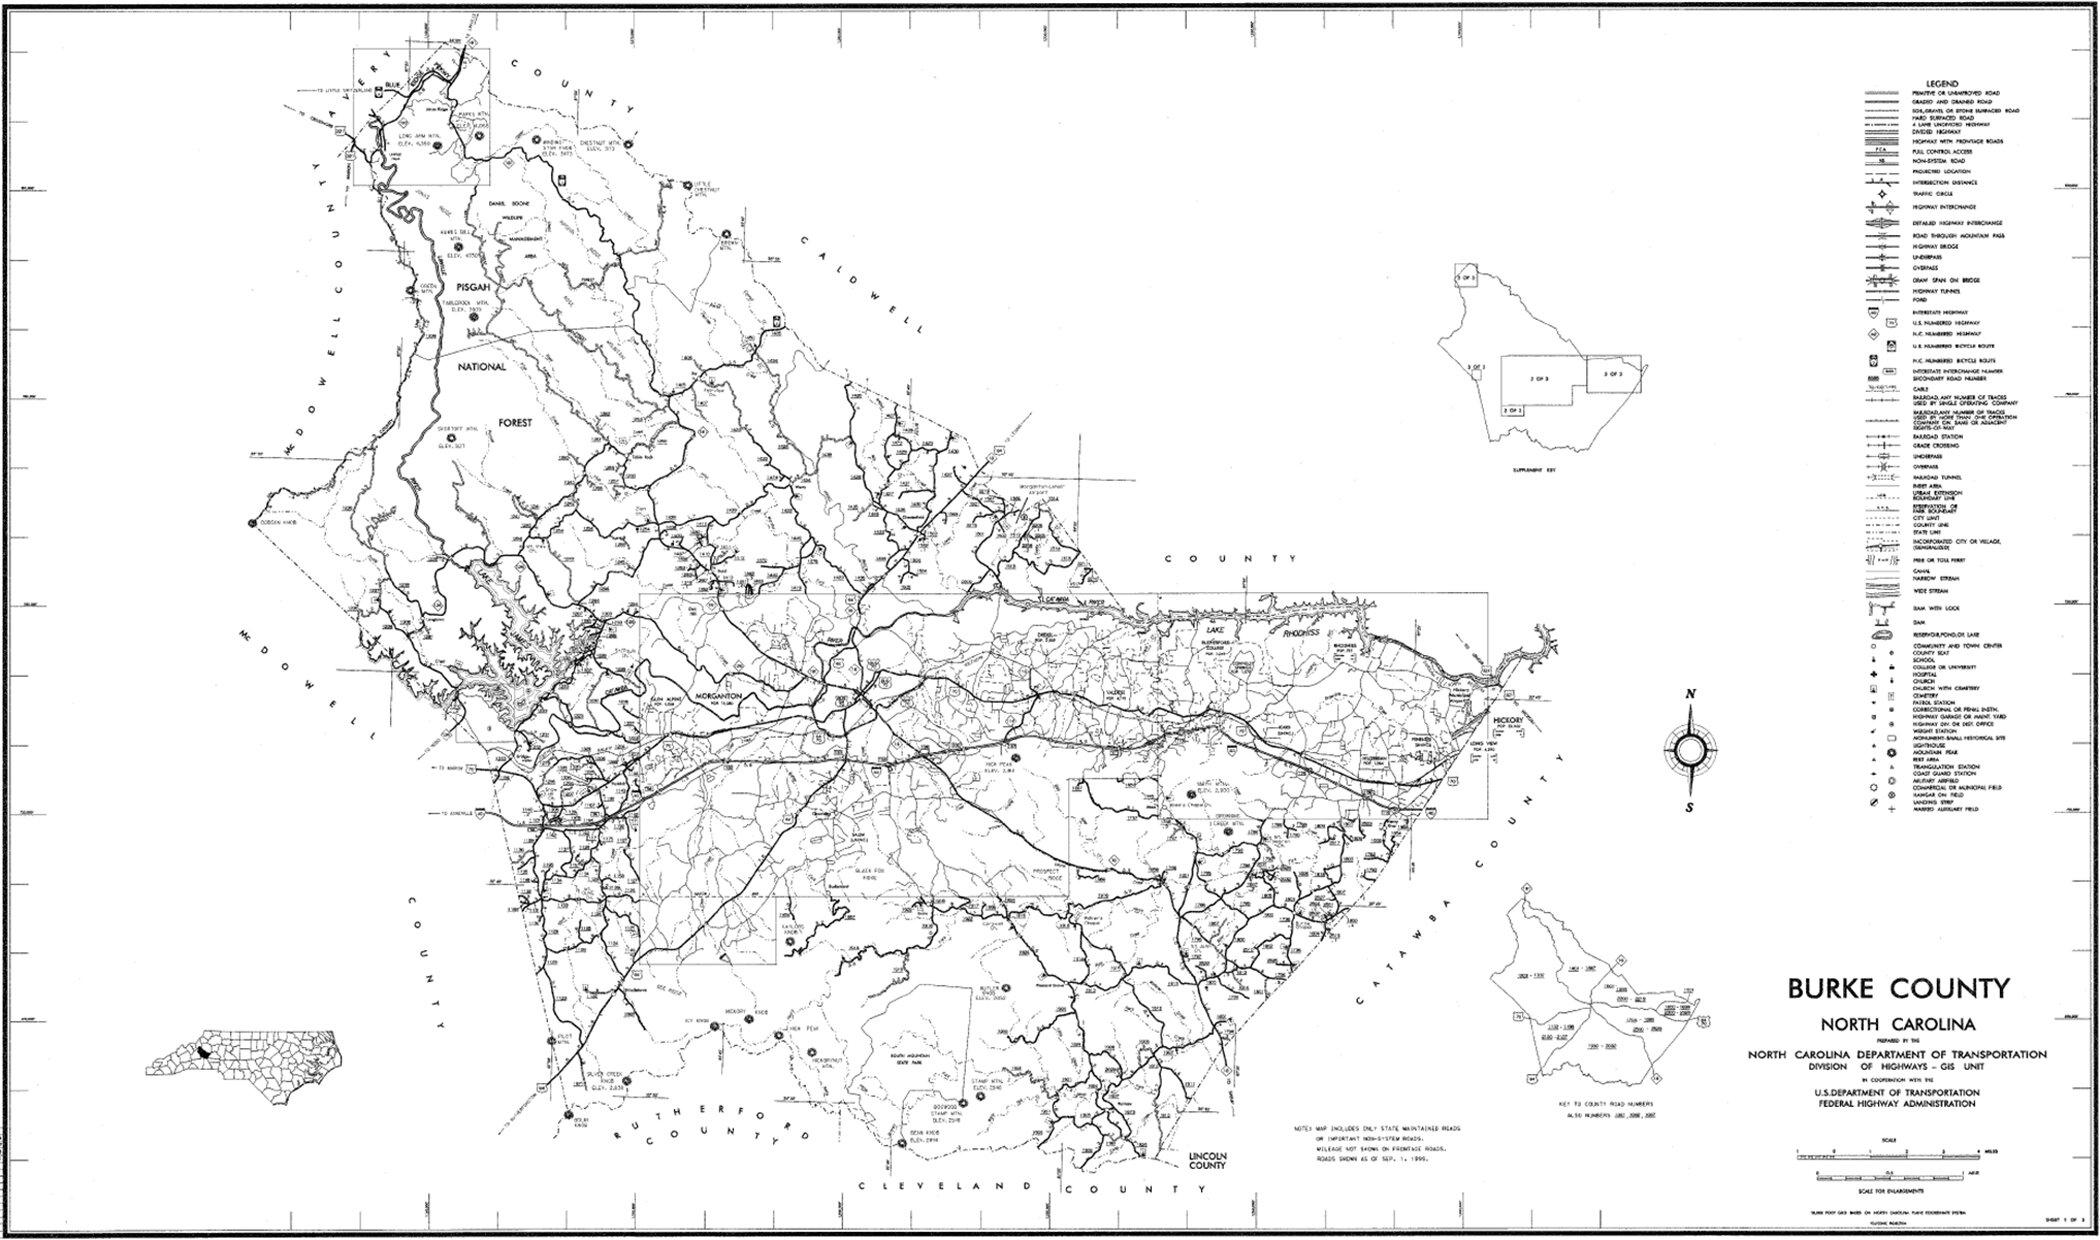 Burke_County_Road_Map_2000.jpg